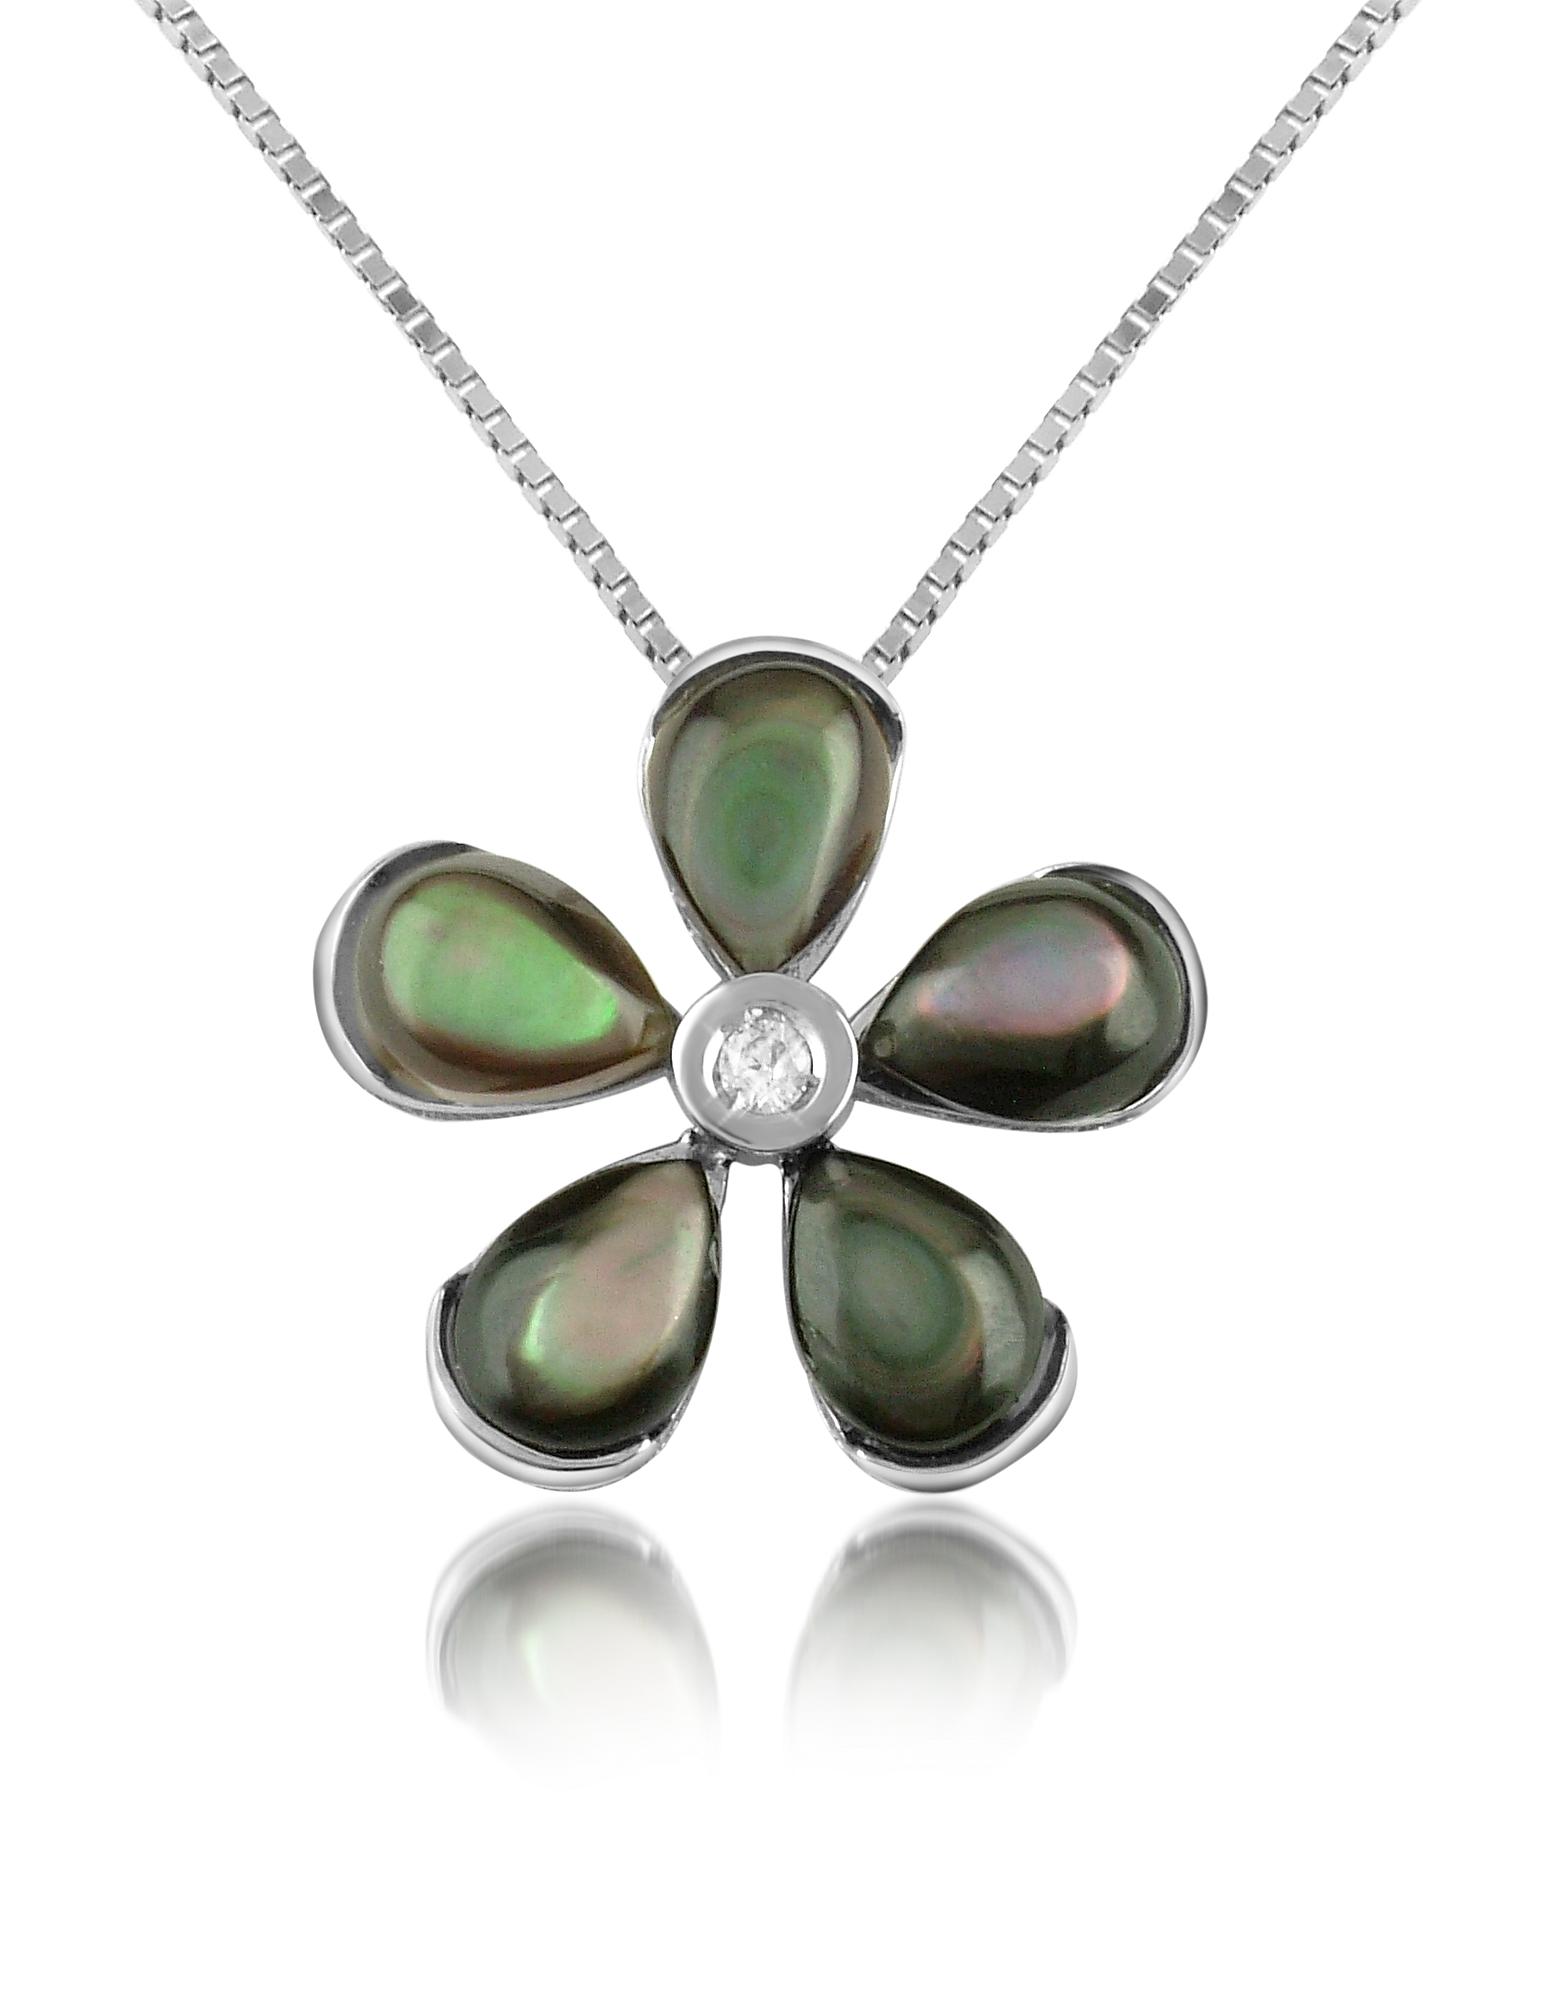 Del Gatto Necklaces, Diamond Gemstone Flower 18K Gold Pendant Necklace